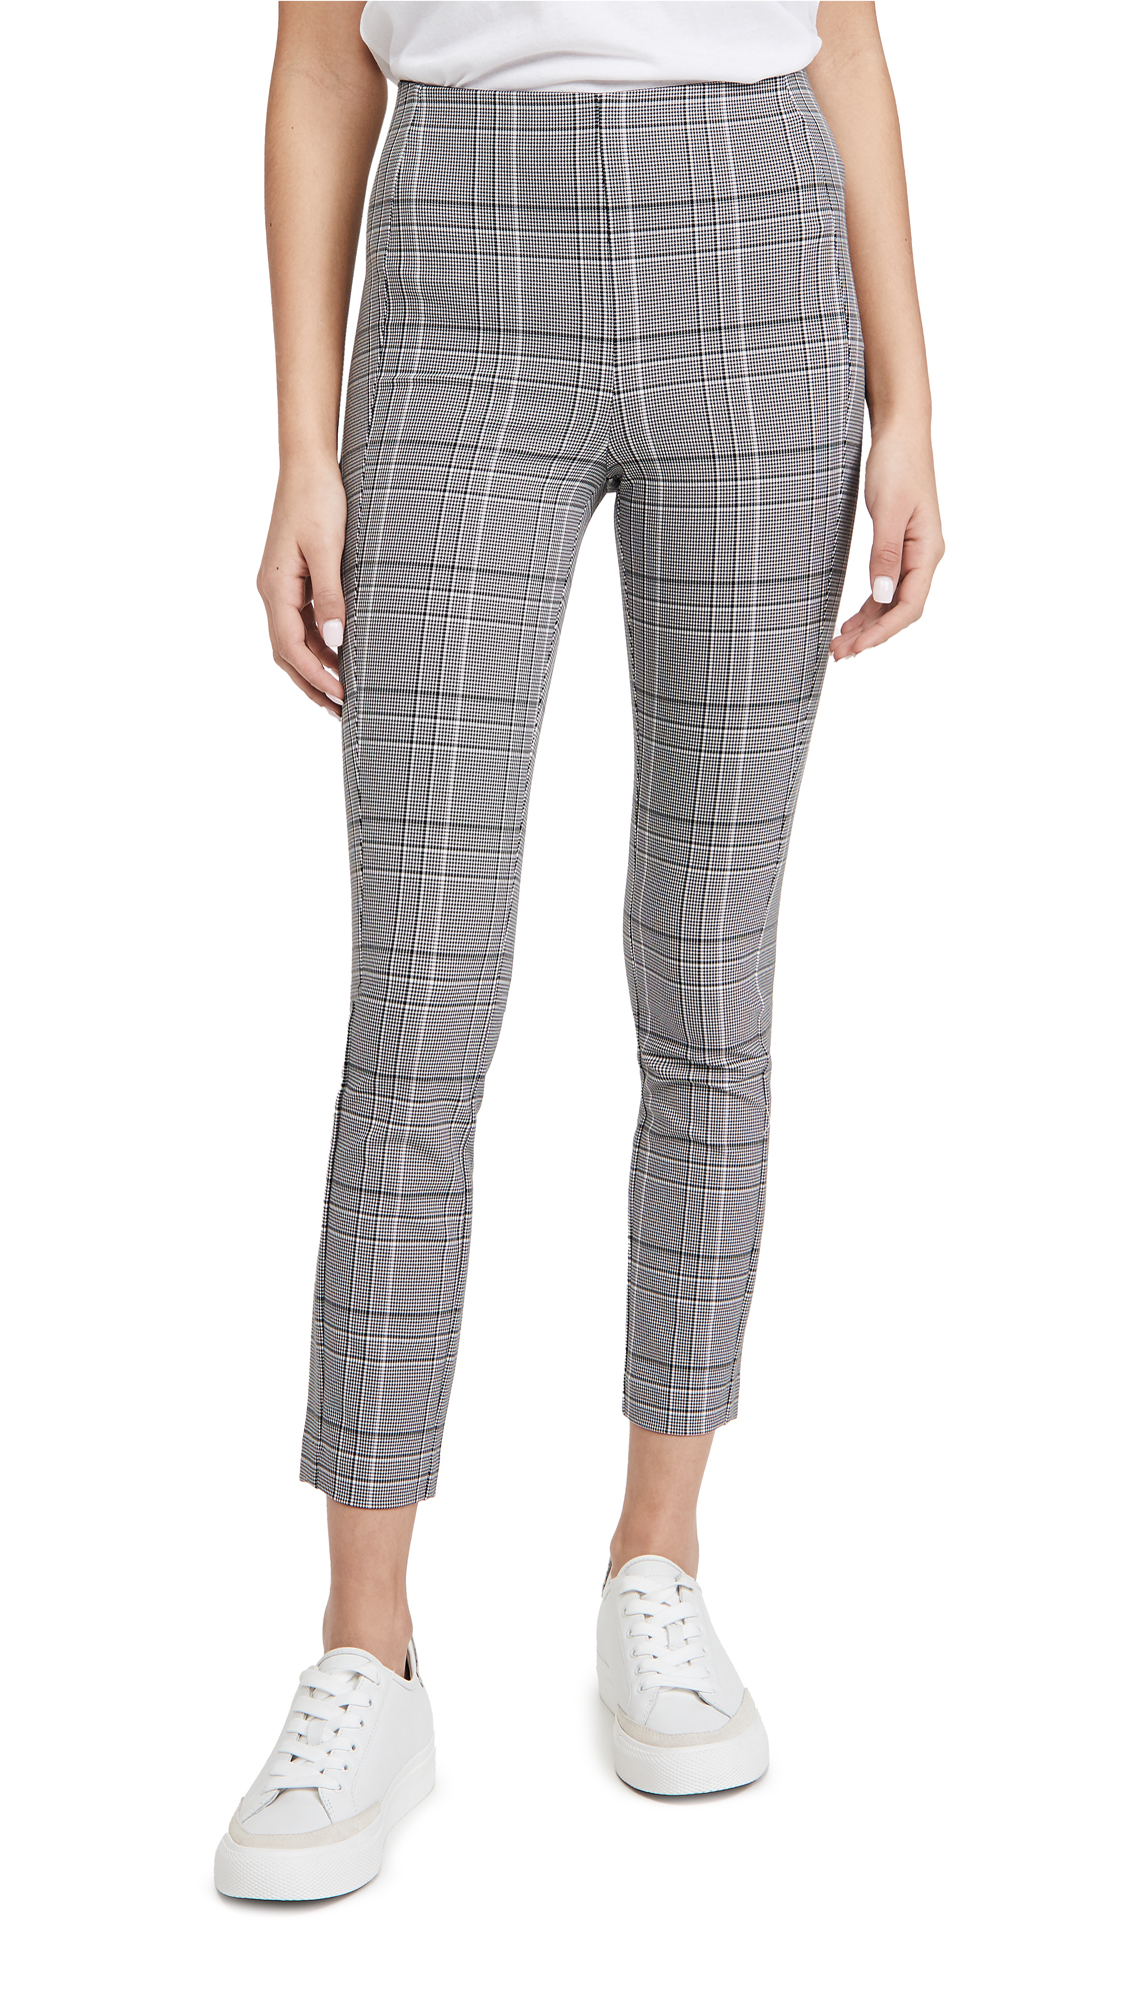 Rag & Bone Pants SIMONE PANTS